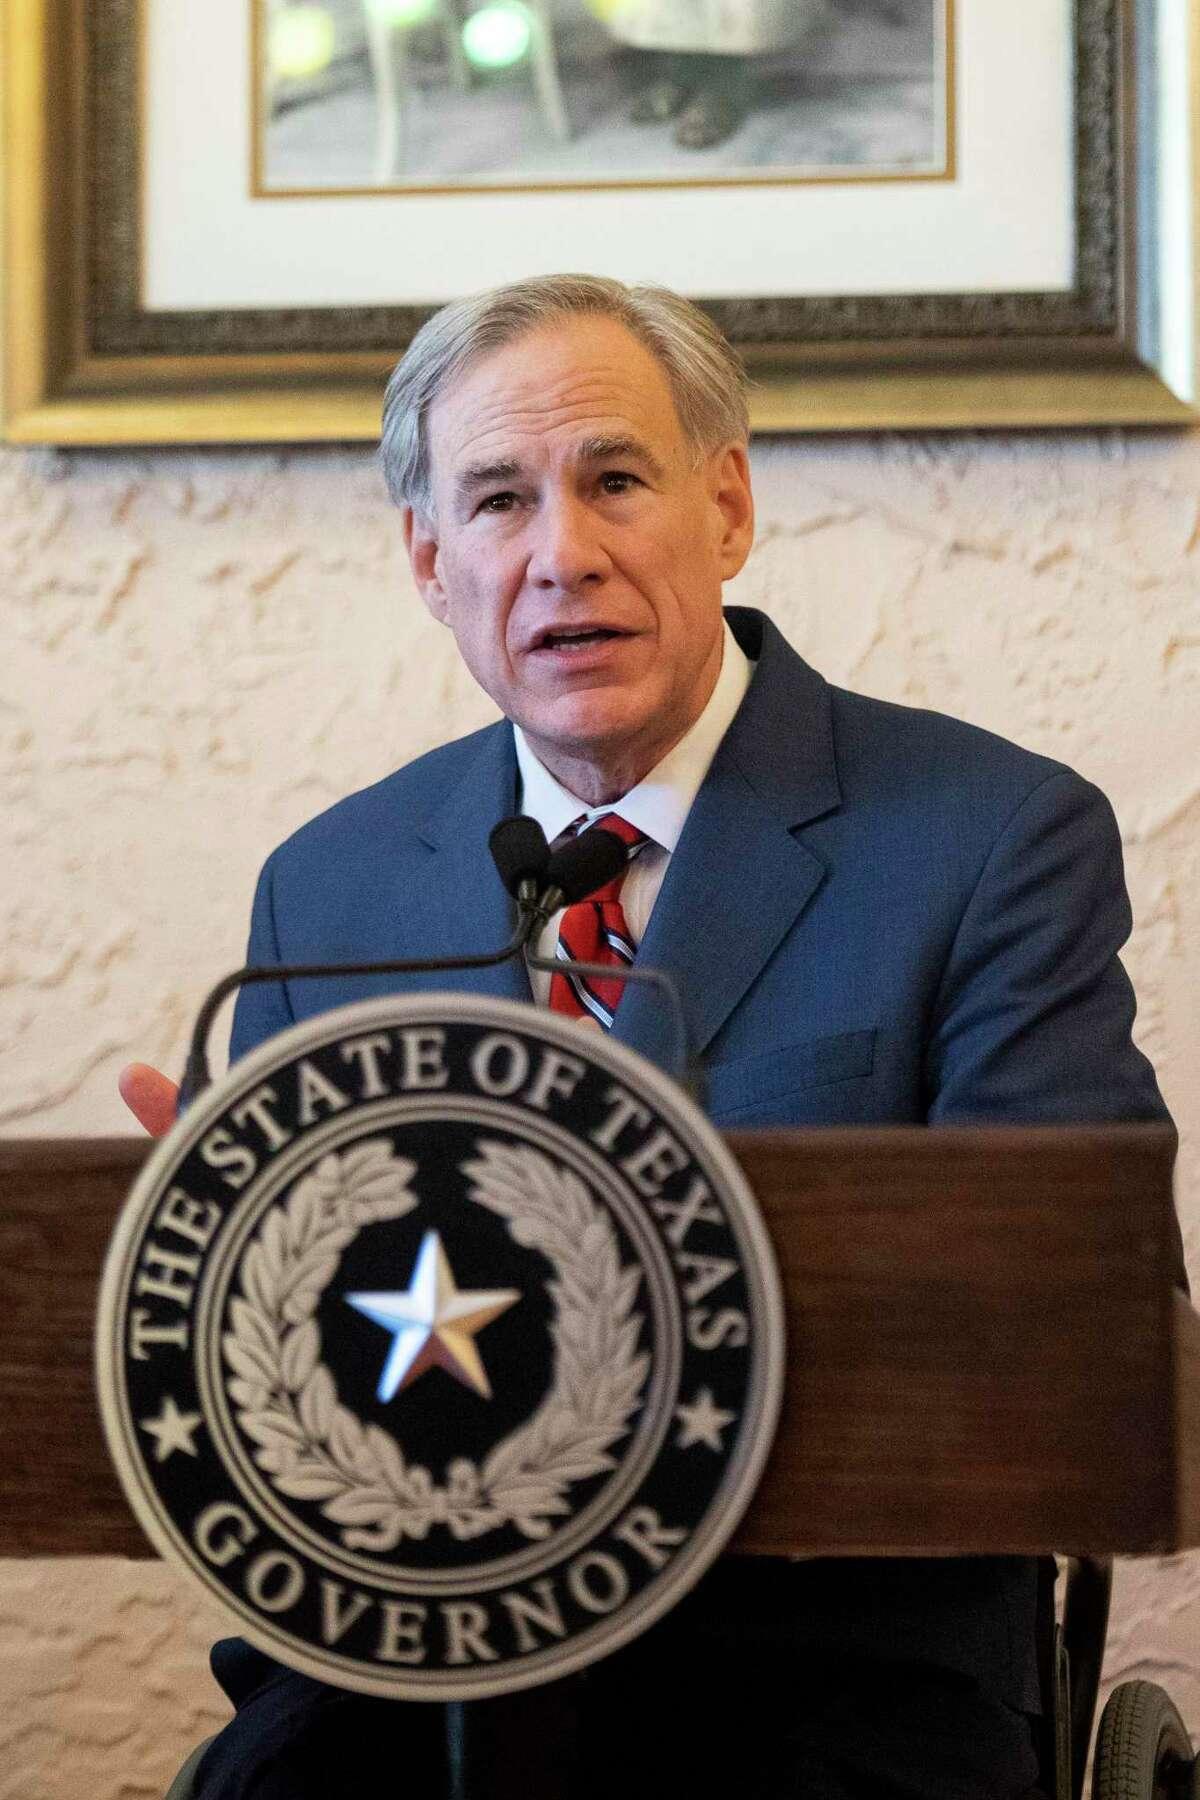 Gov. Greg Abbott, speaking in Lubbock, said Texans should still follow recommended guidelines.